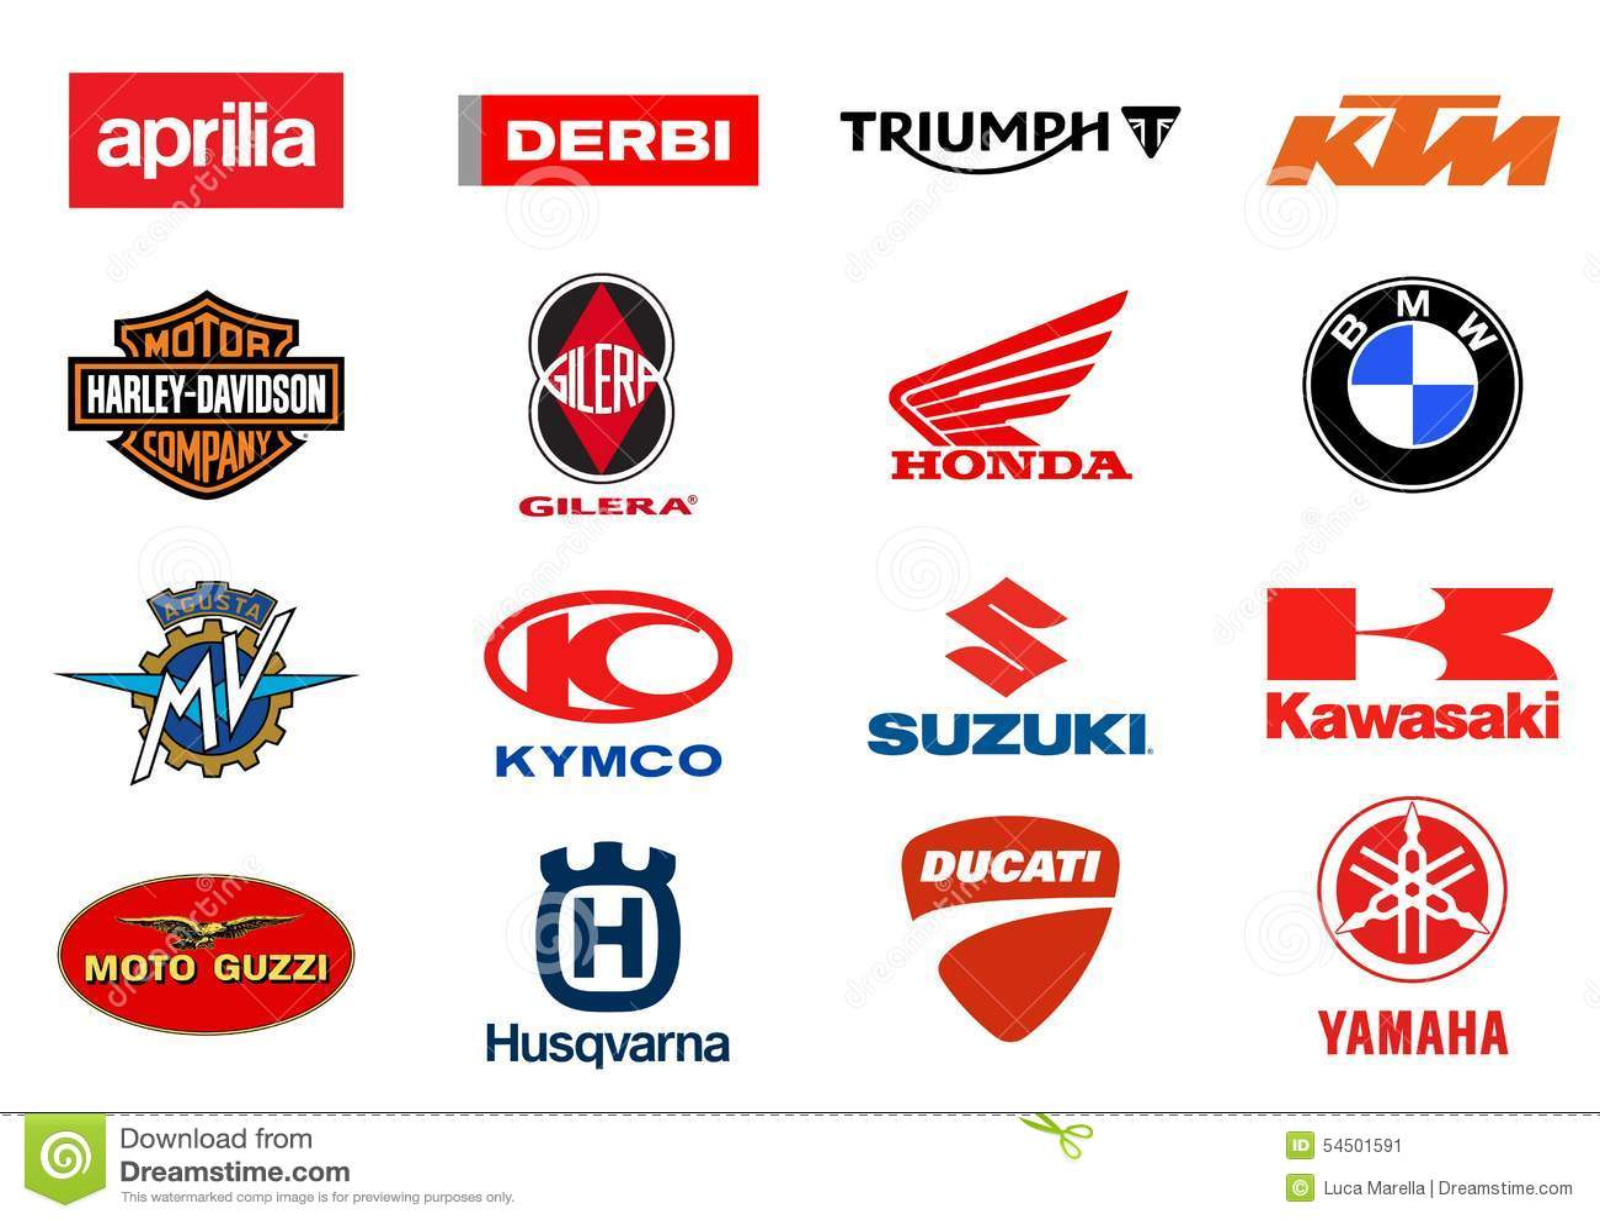 motorcycles producers logos editorial photo illustration motorcycle logos clip art motorcycle logos clip art